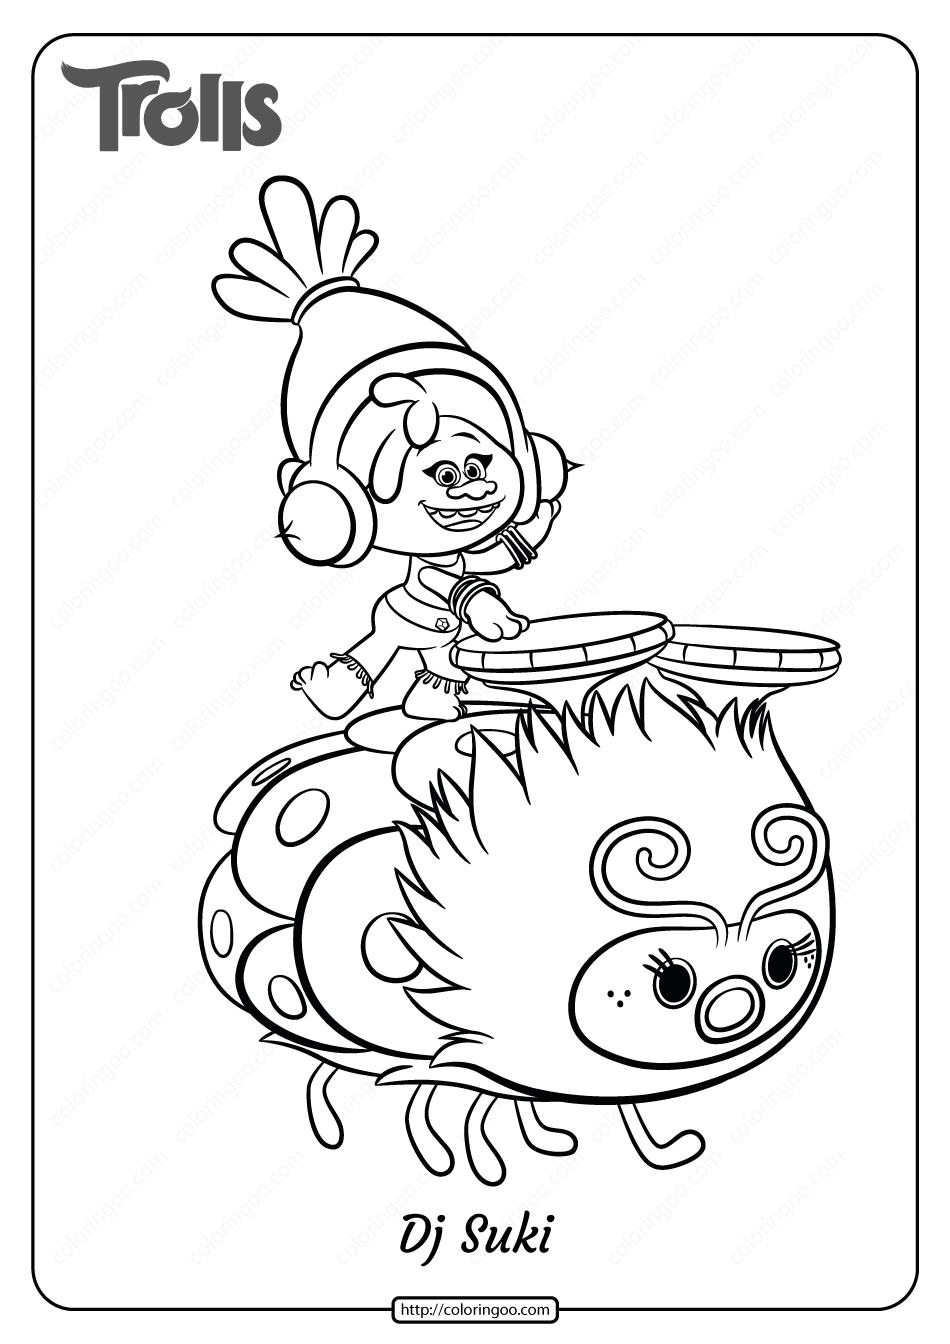 Free Printable Trolls Dj Suki Pdf Coloring Page 13 In 2020 Cartoon Coloring Pages Poppy Coloring Page Coloring Pages